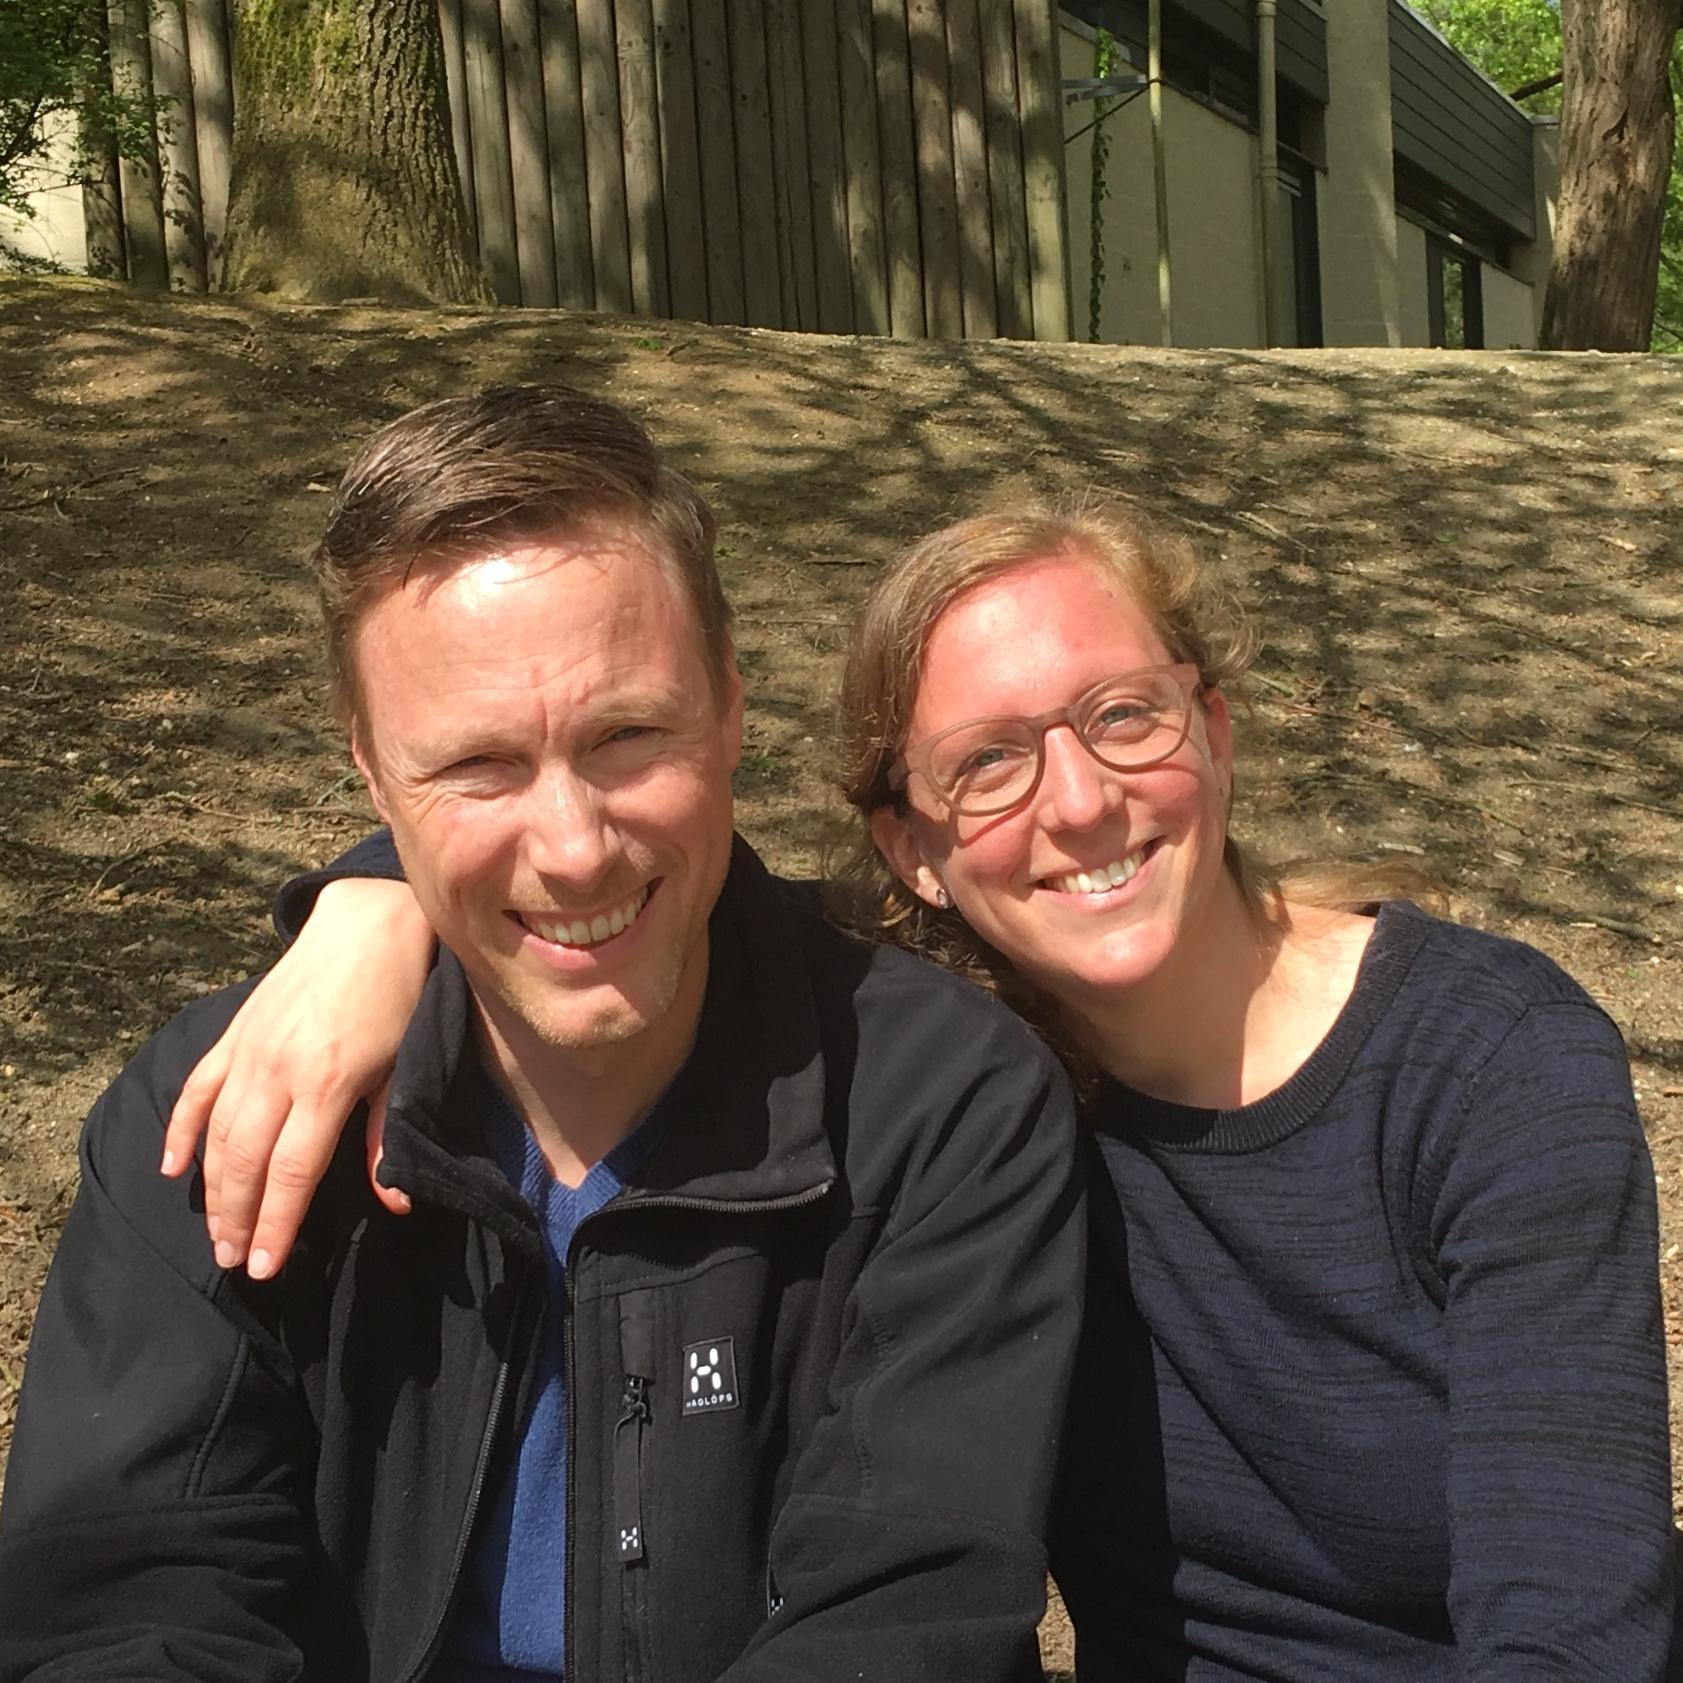 Cluj Napoca snelheid dating Adelaide Kane dating Ian Somerhalder